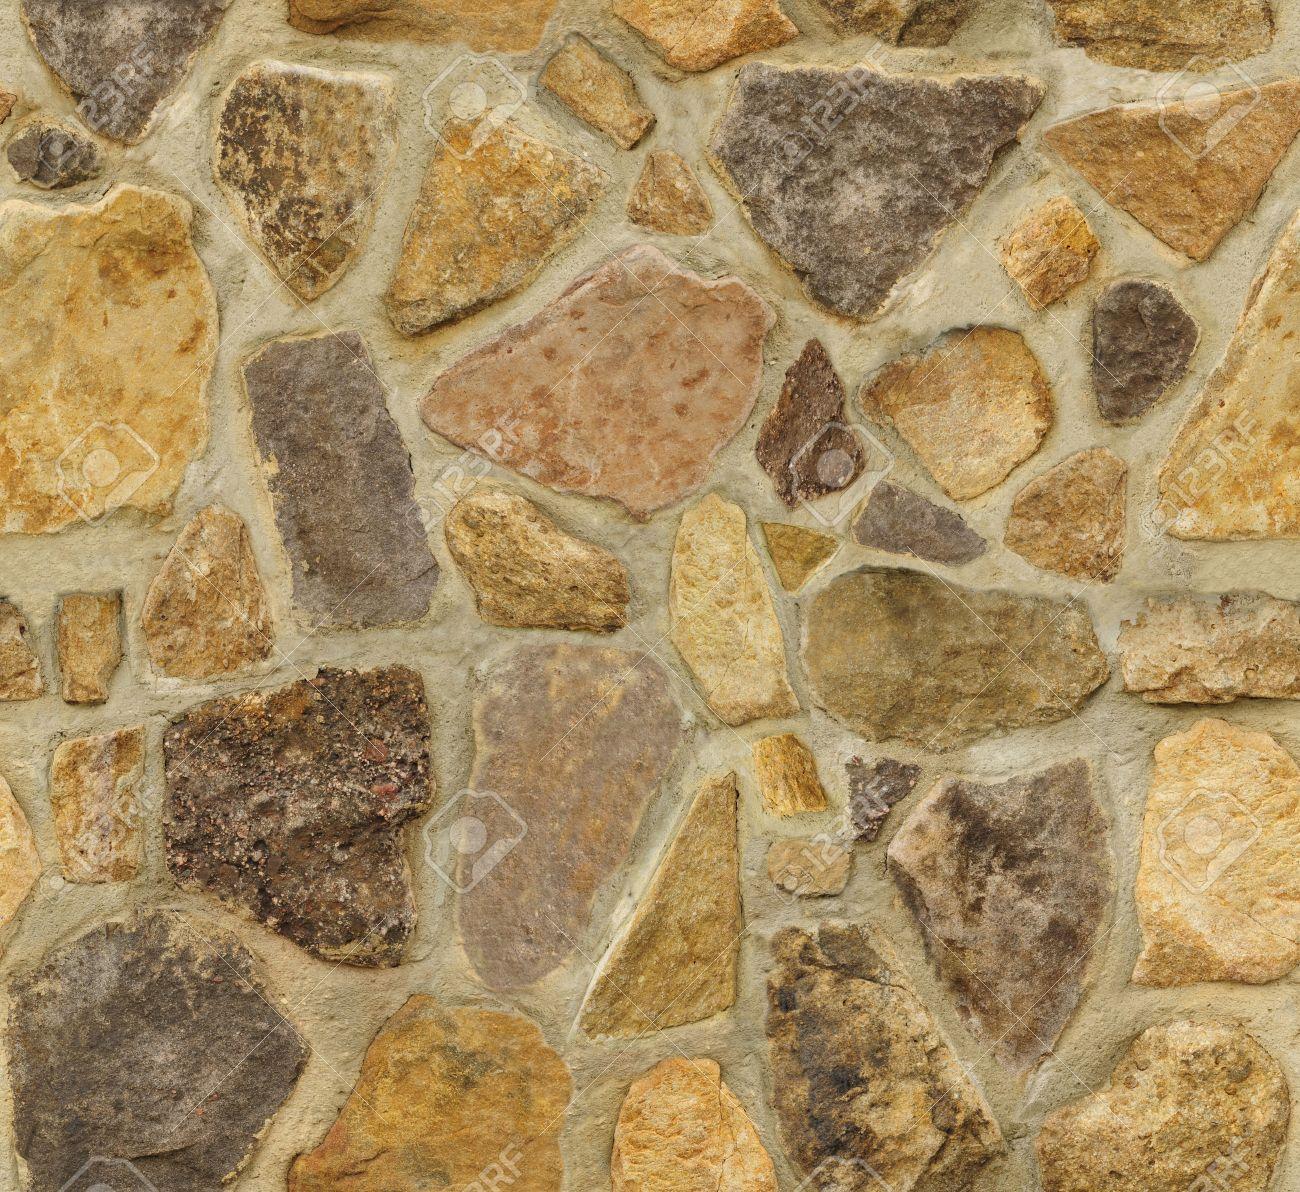 Seamless masonry wall with irregular shaped stones. The texture repeats seamlessly both vertically and horizontally. - 7059991